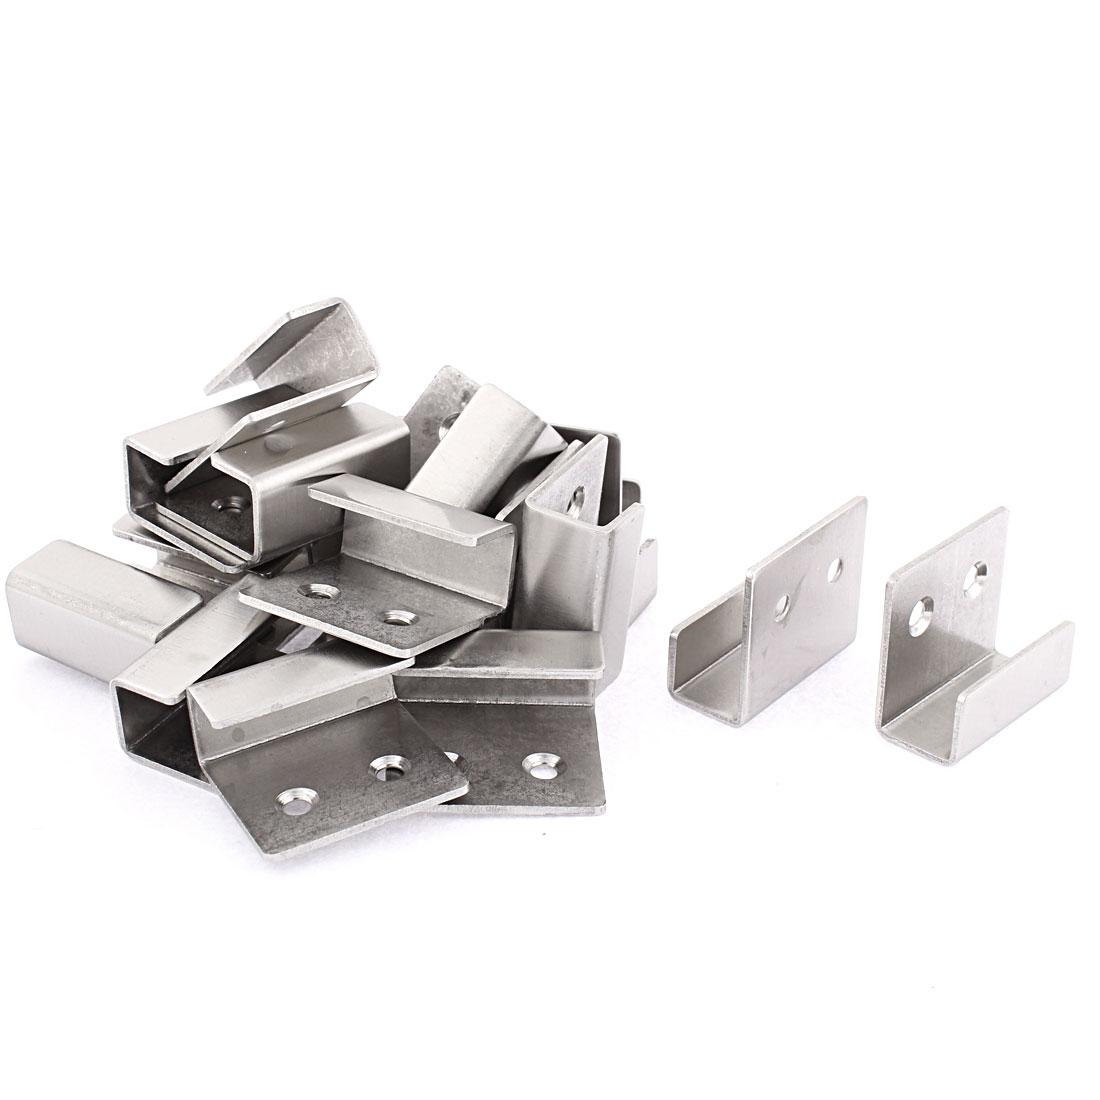 Ceramic Tile Display Wall Hanger Fasteners Silver Tone 20pcs